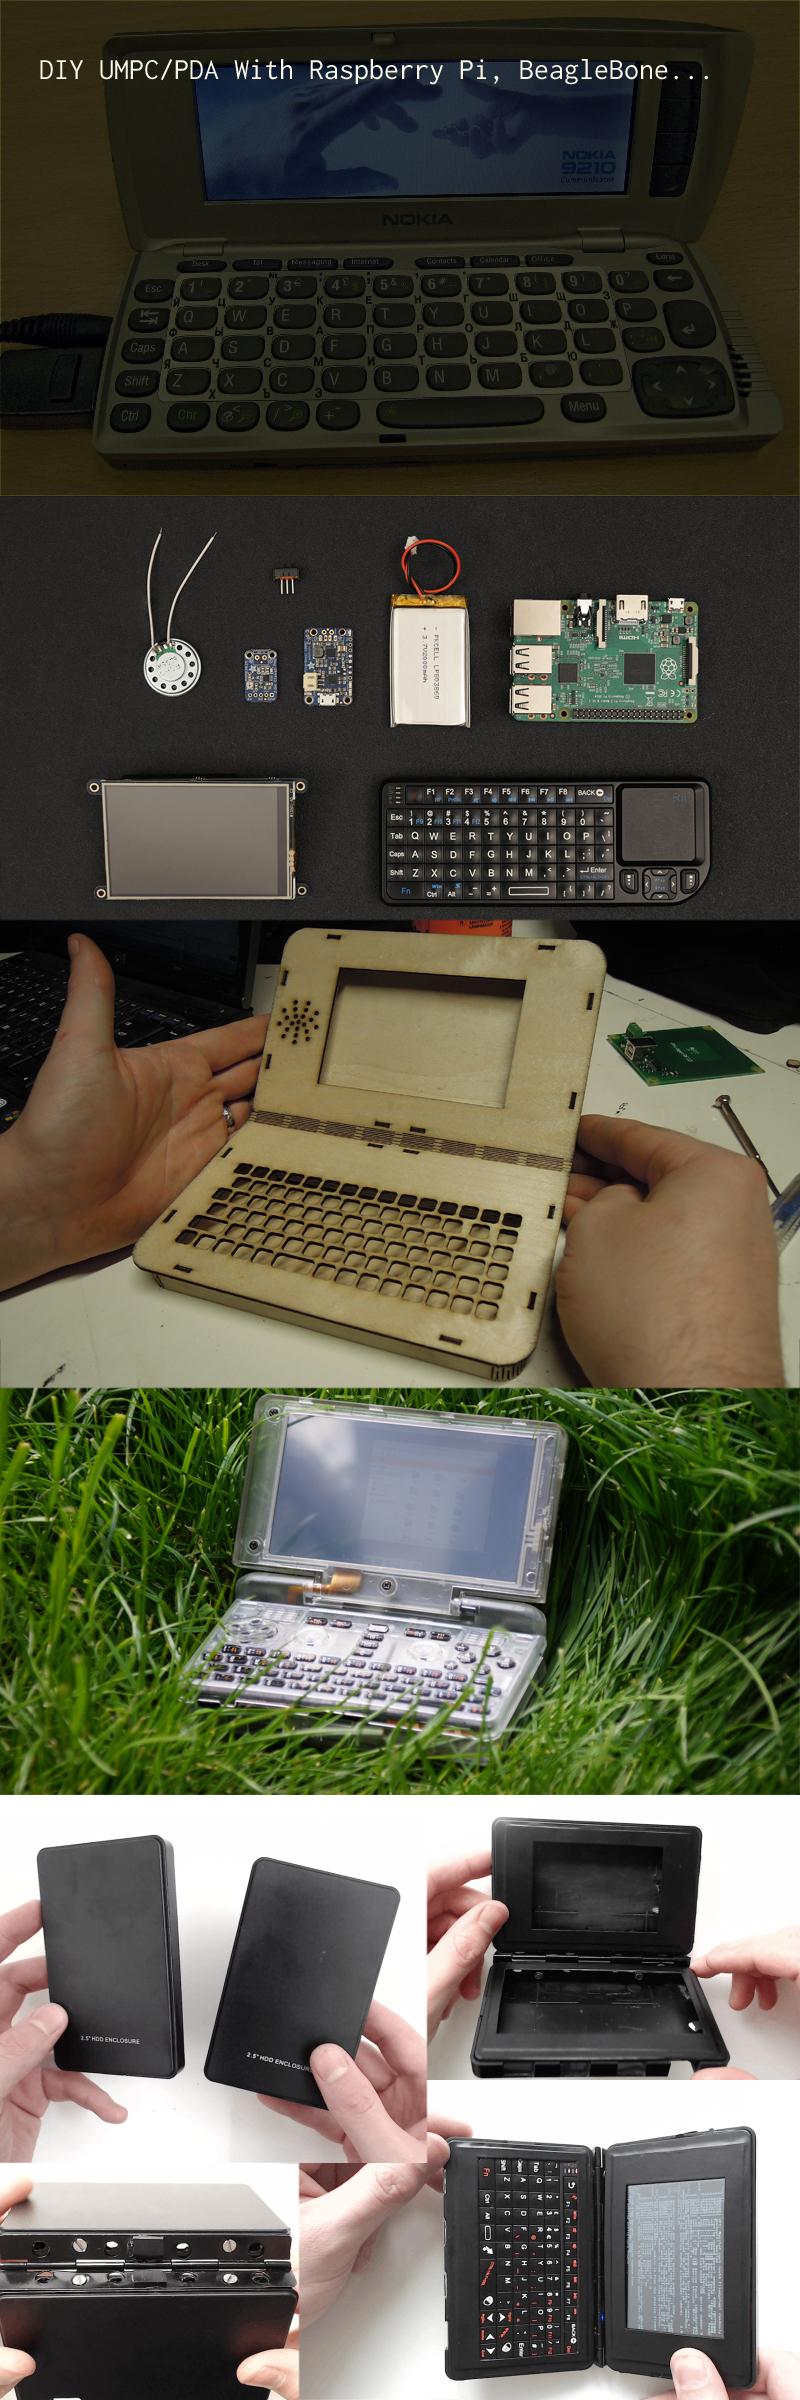 DIY-UMPCPDA-With-Raspberry-Pi-BeagleBone